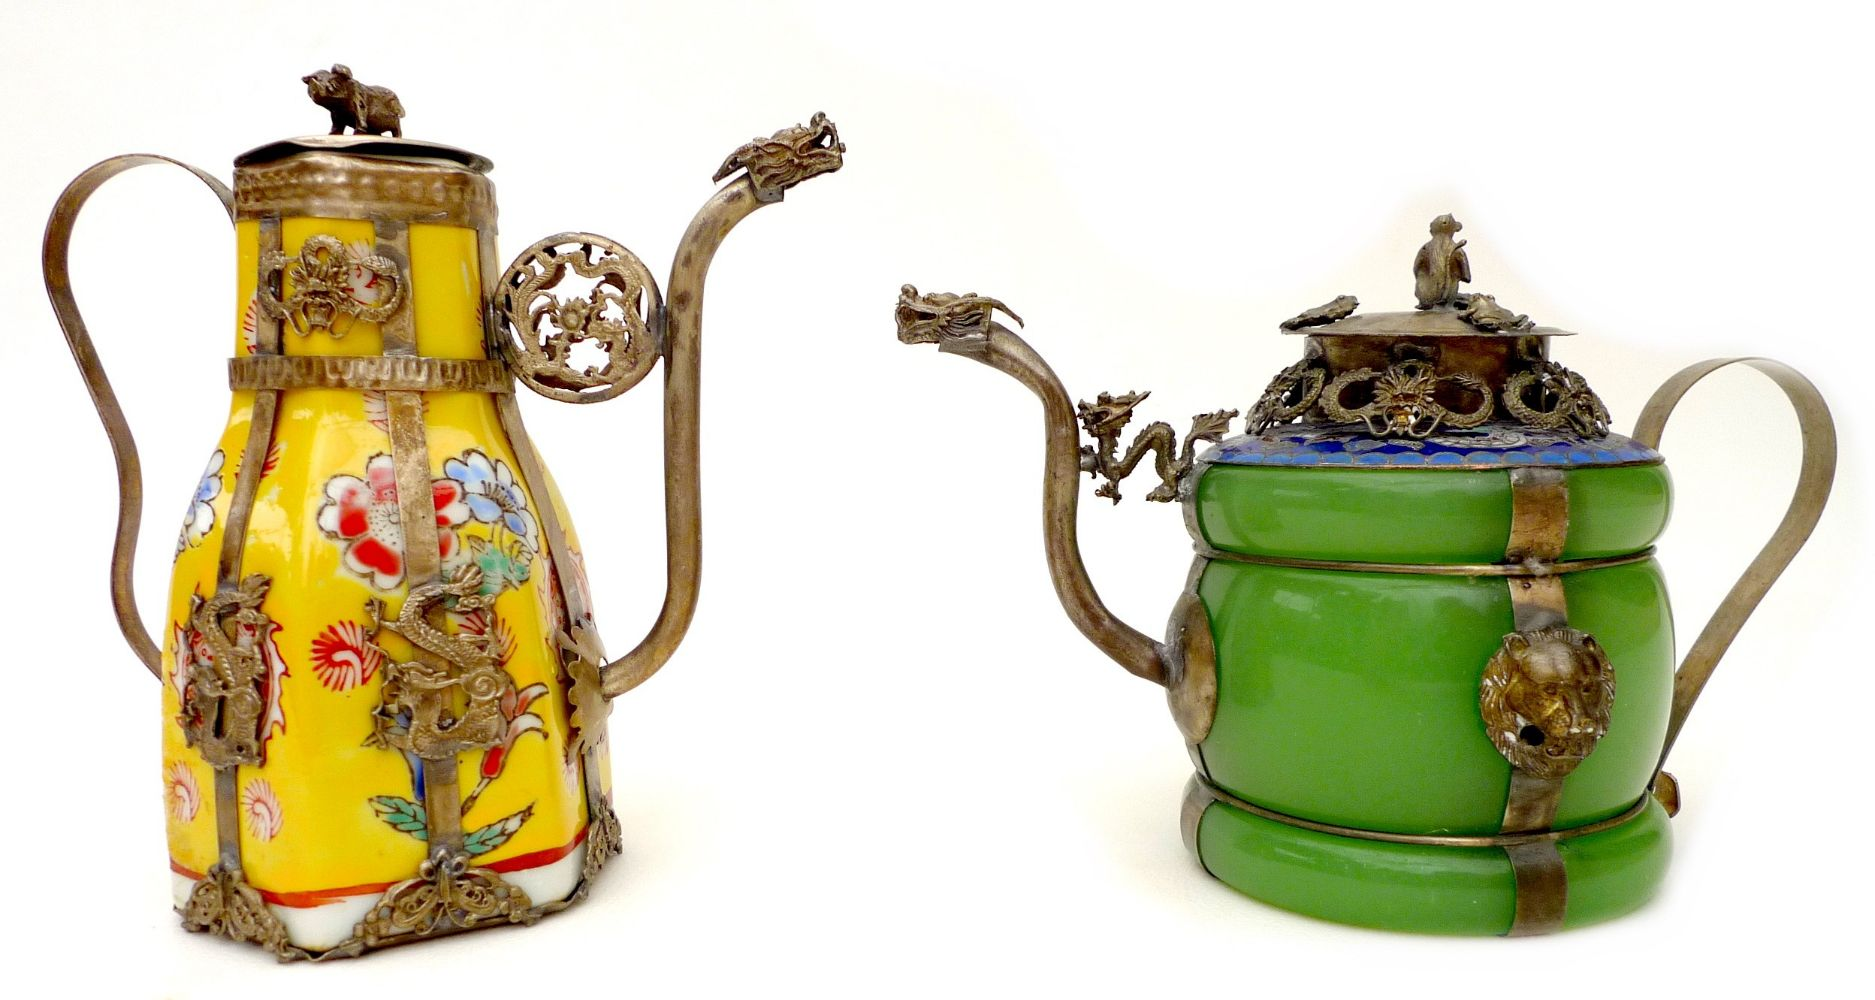 Fine Art, Antiques & Specialist Collectors - LIVE ONLINE ONLY